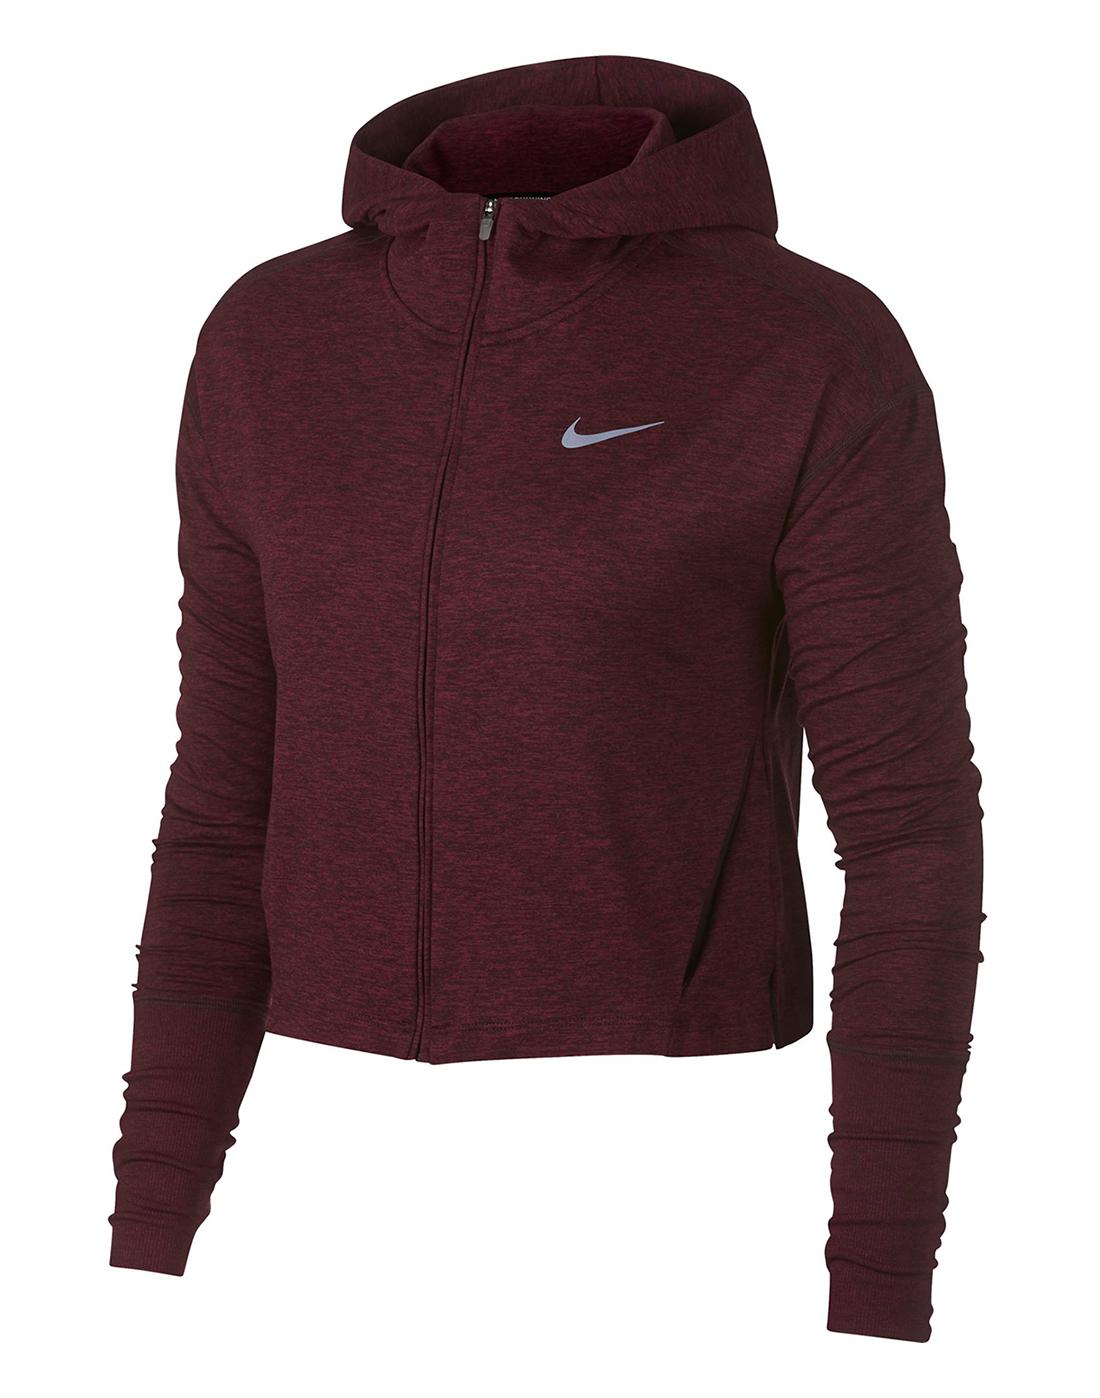 9b0f861e7ea8 Women s Nike Full Zip Running Hoody